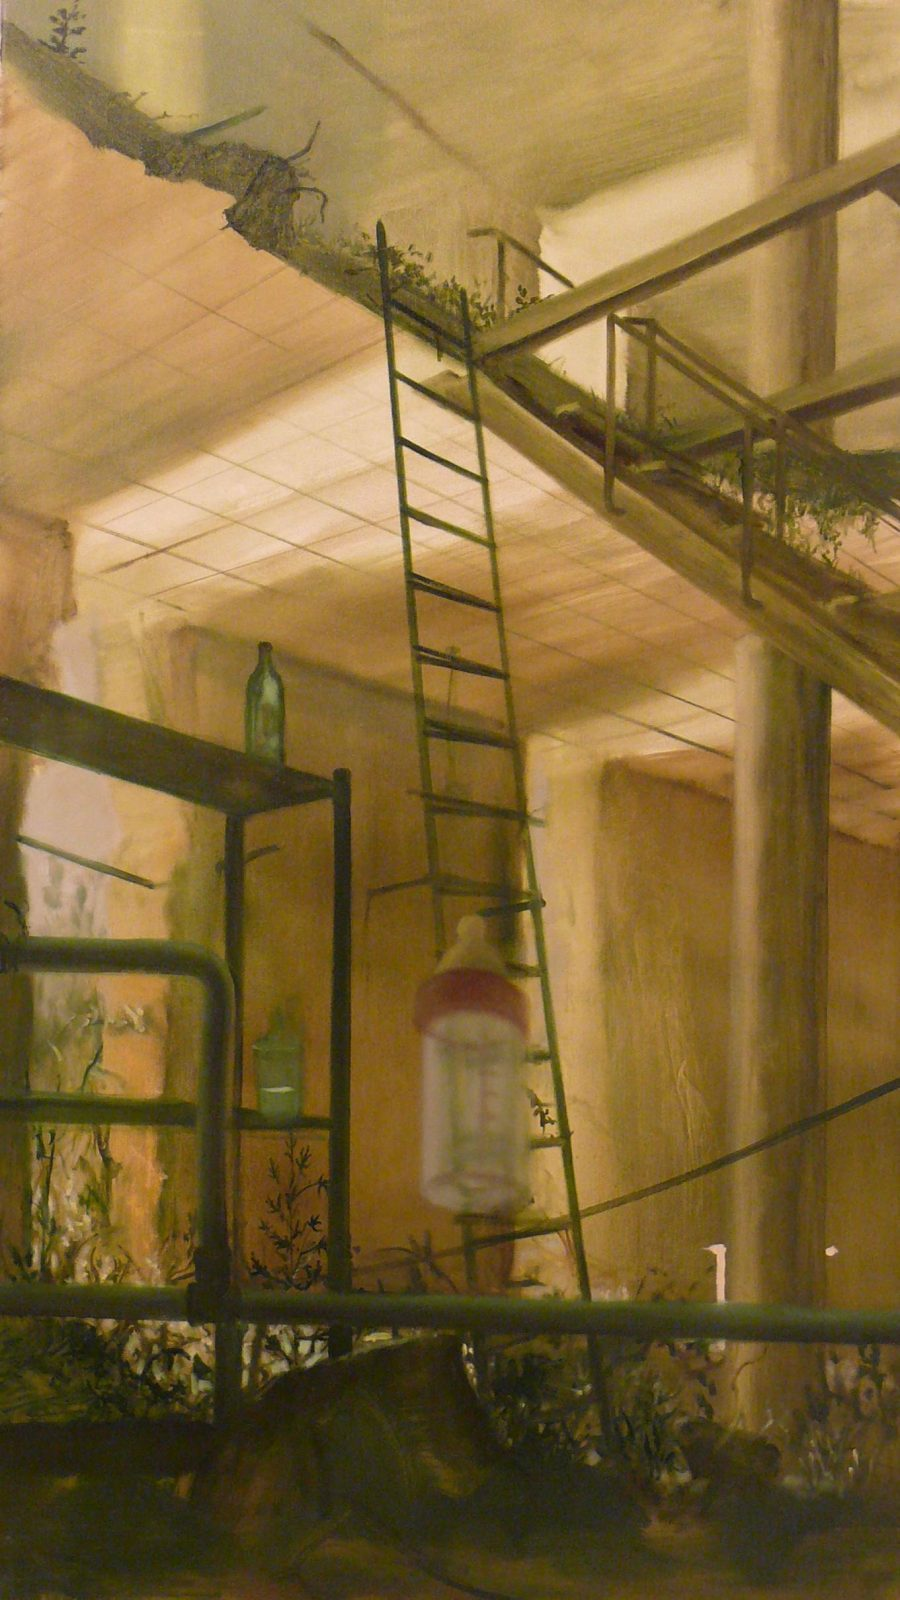 Herman Levente: Zóna 15 – Emelkedő